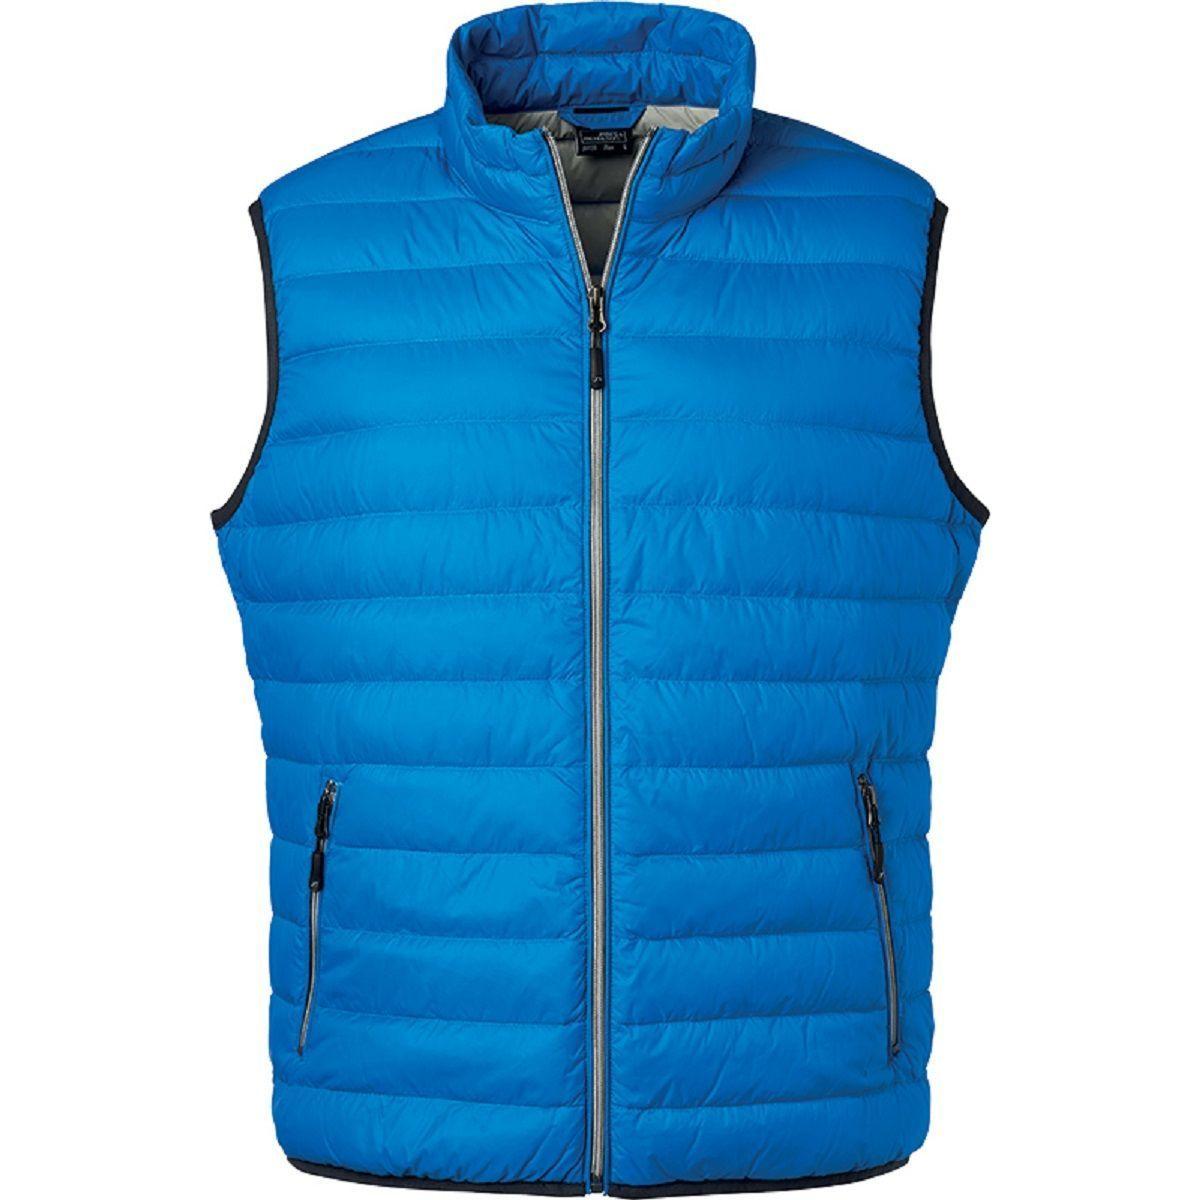 Bodywarmer duvet - JN1138 - bleu cobalt - Homme